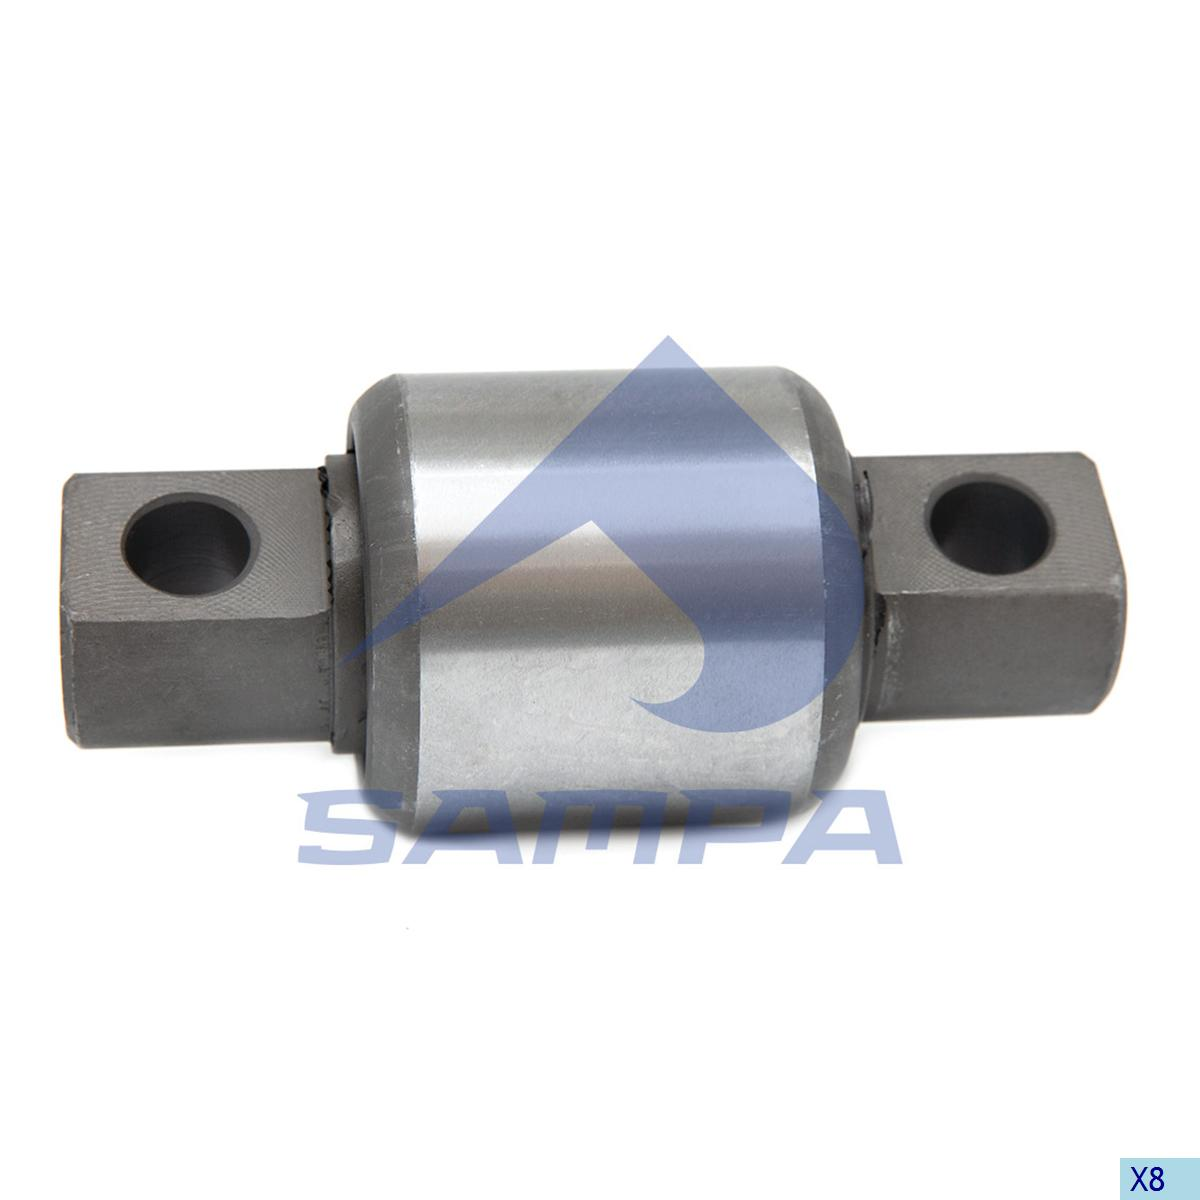 Silent Block, Axle Rod, Volvo, Suspension